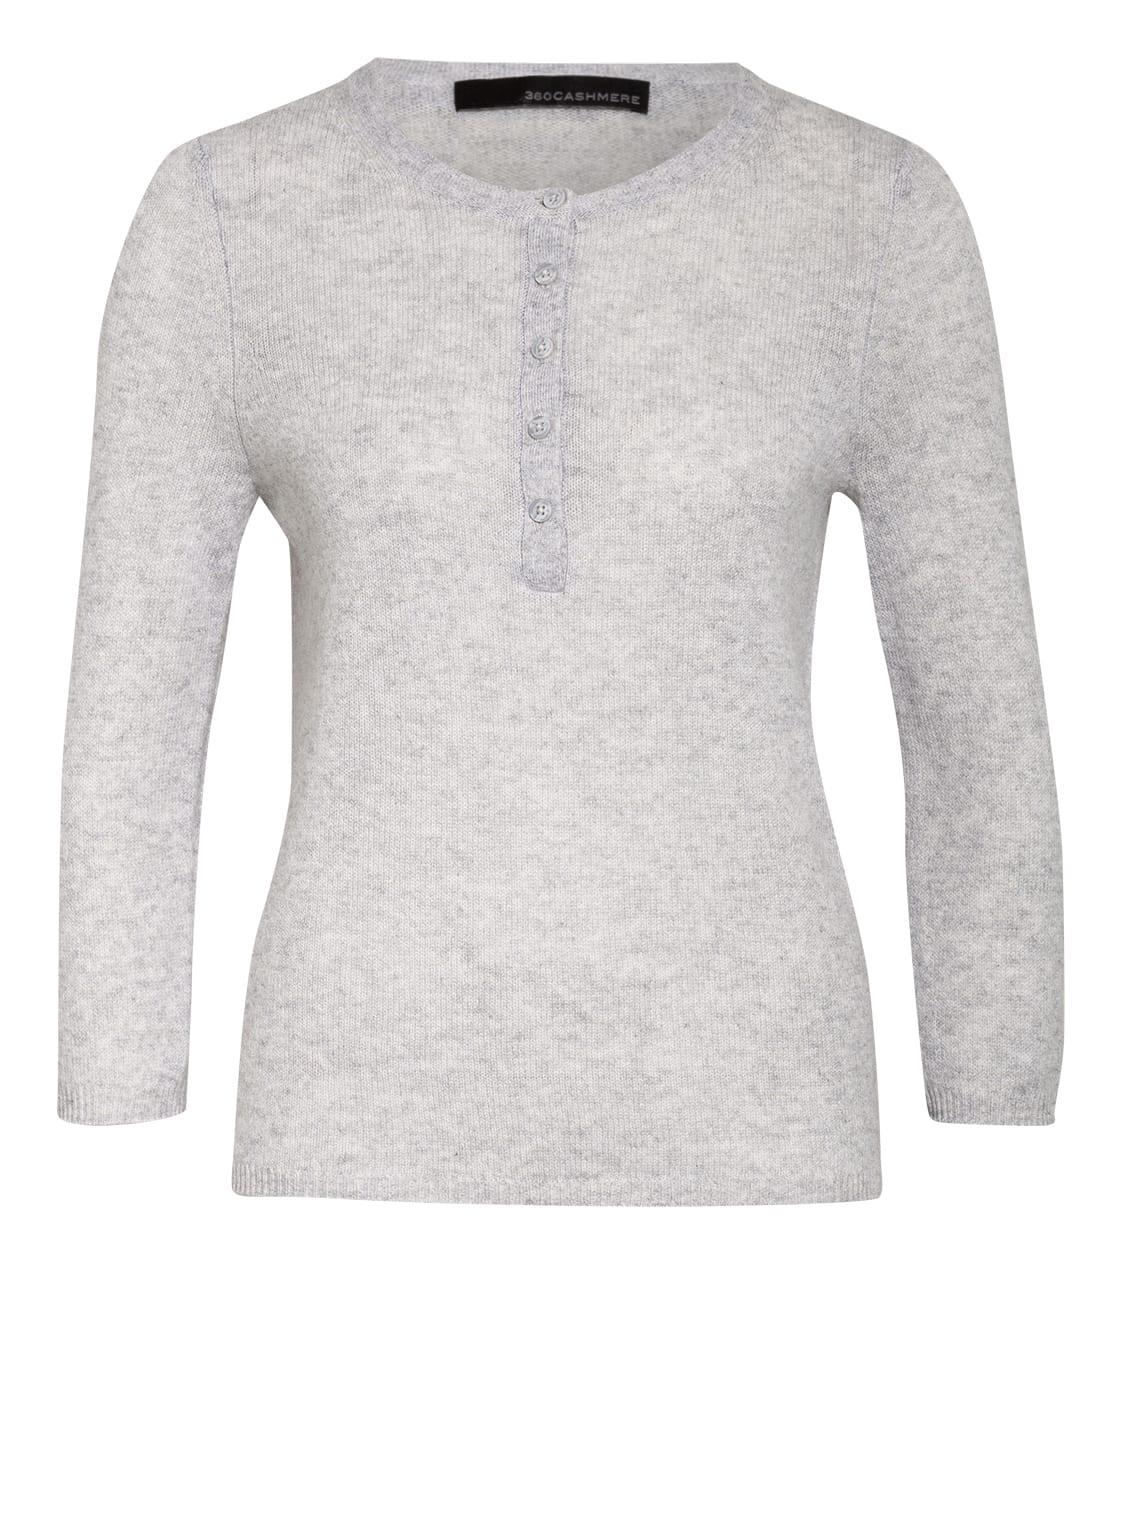 Image of 360cashmere Cashmere-Pullover grau